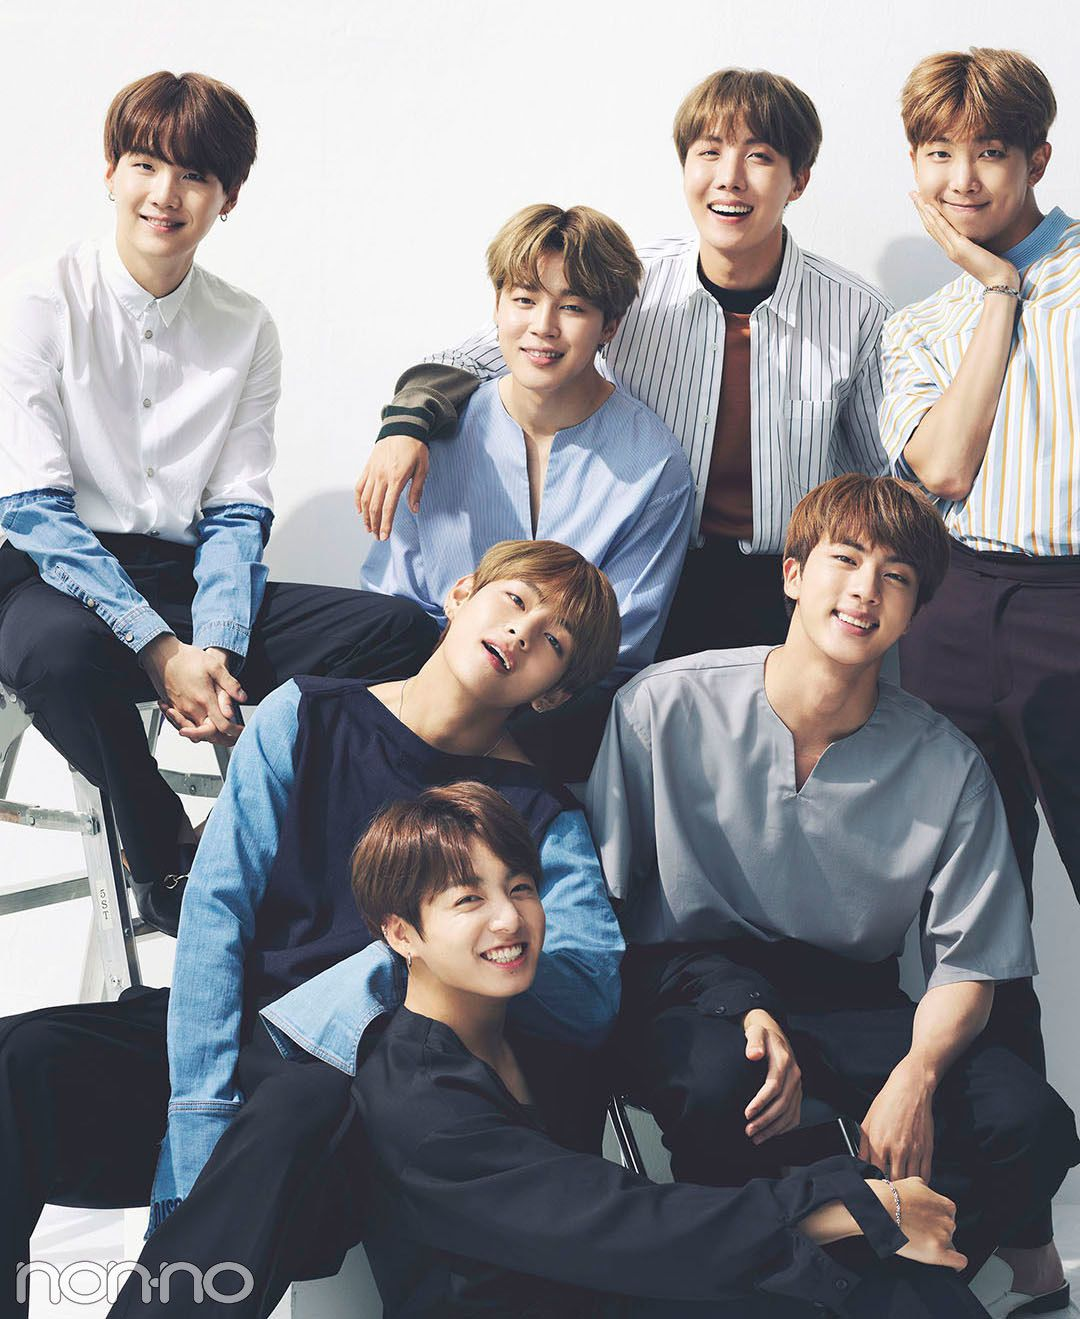 Bts Group Photo 2019 Korean Idol